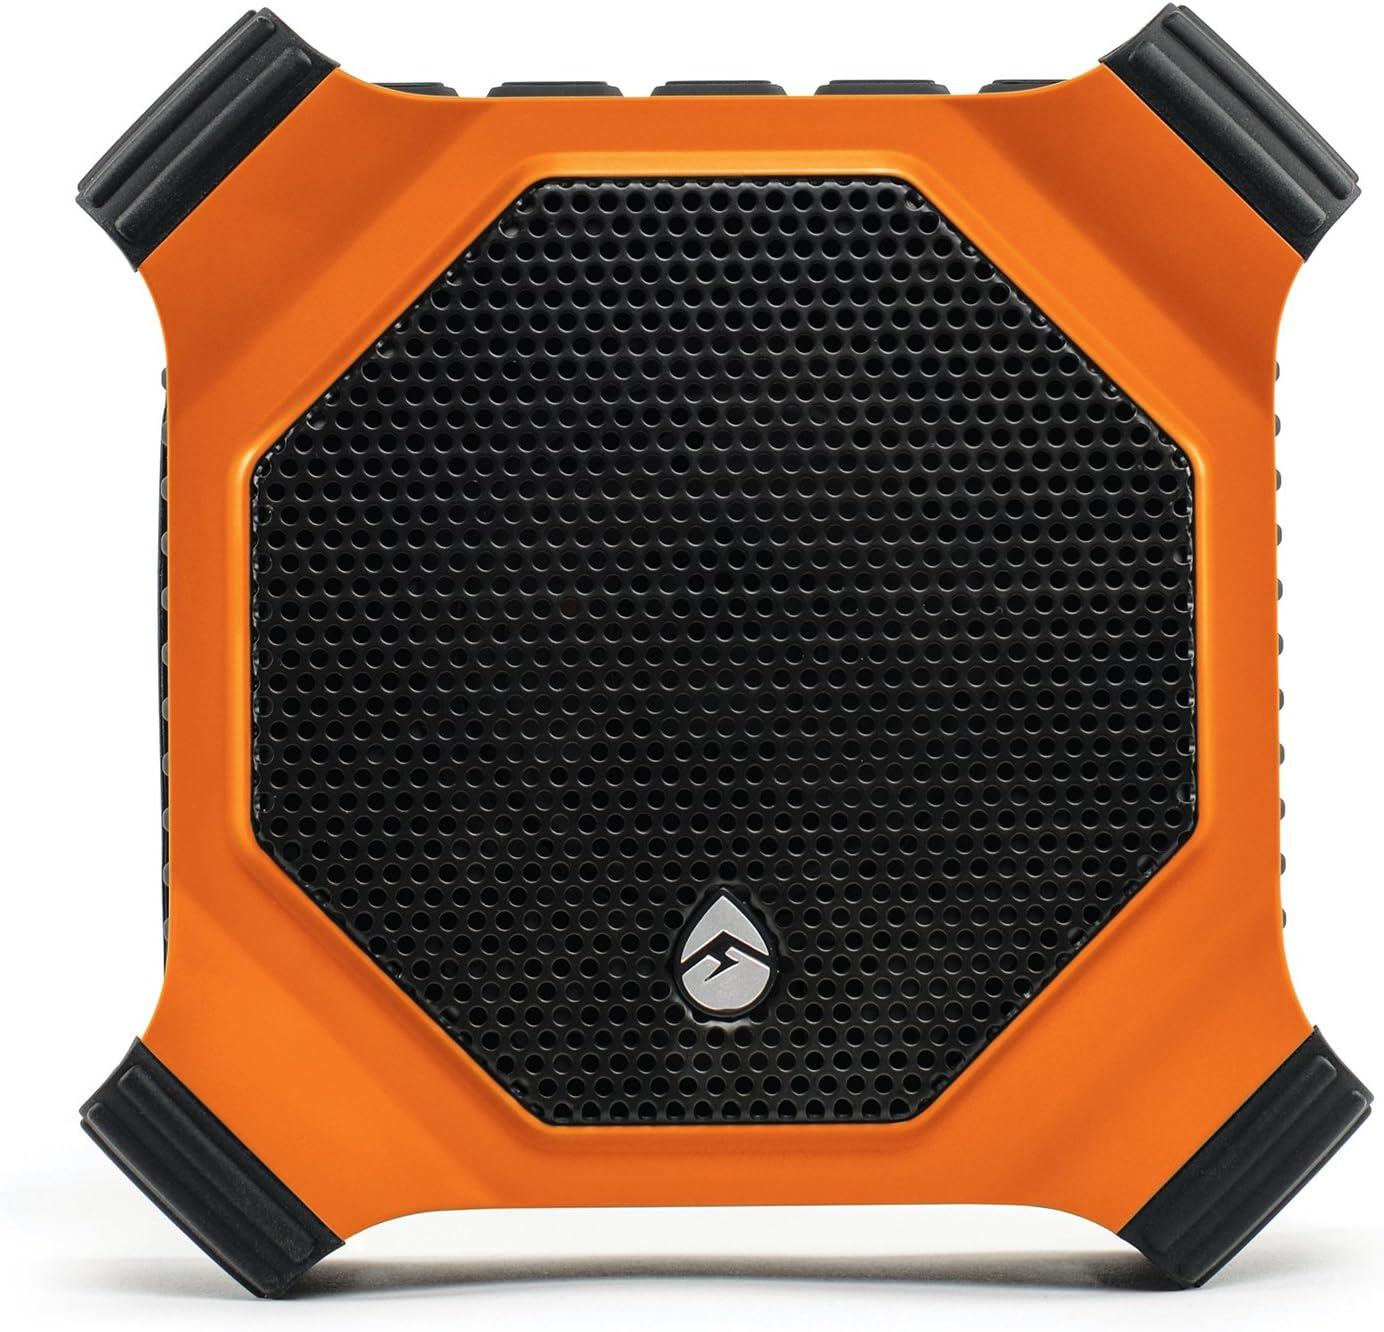 ECOXGEAR EcoDrift GDI-EXDRFT8 Rugged Waterproof Floating Portable  Bluetooth Wireless 8-Watt Smart Speaker with Integrated Siri & Google  Voice